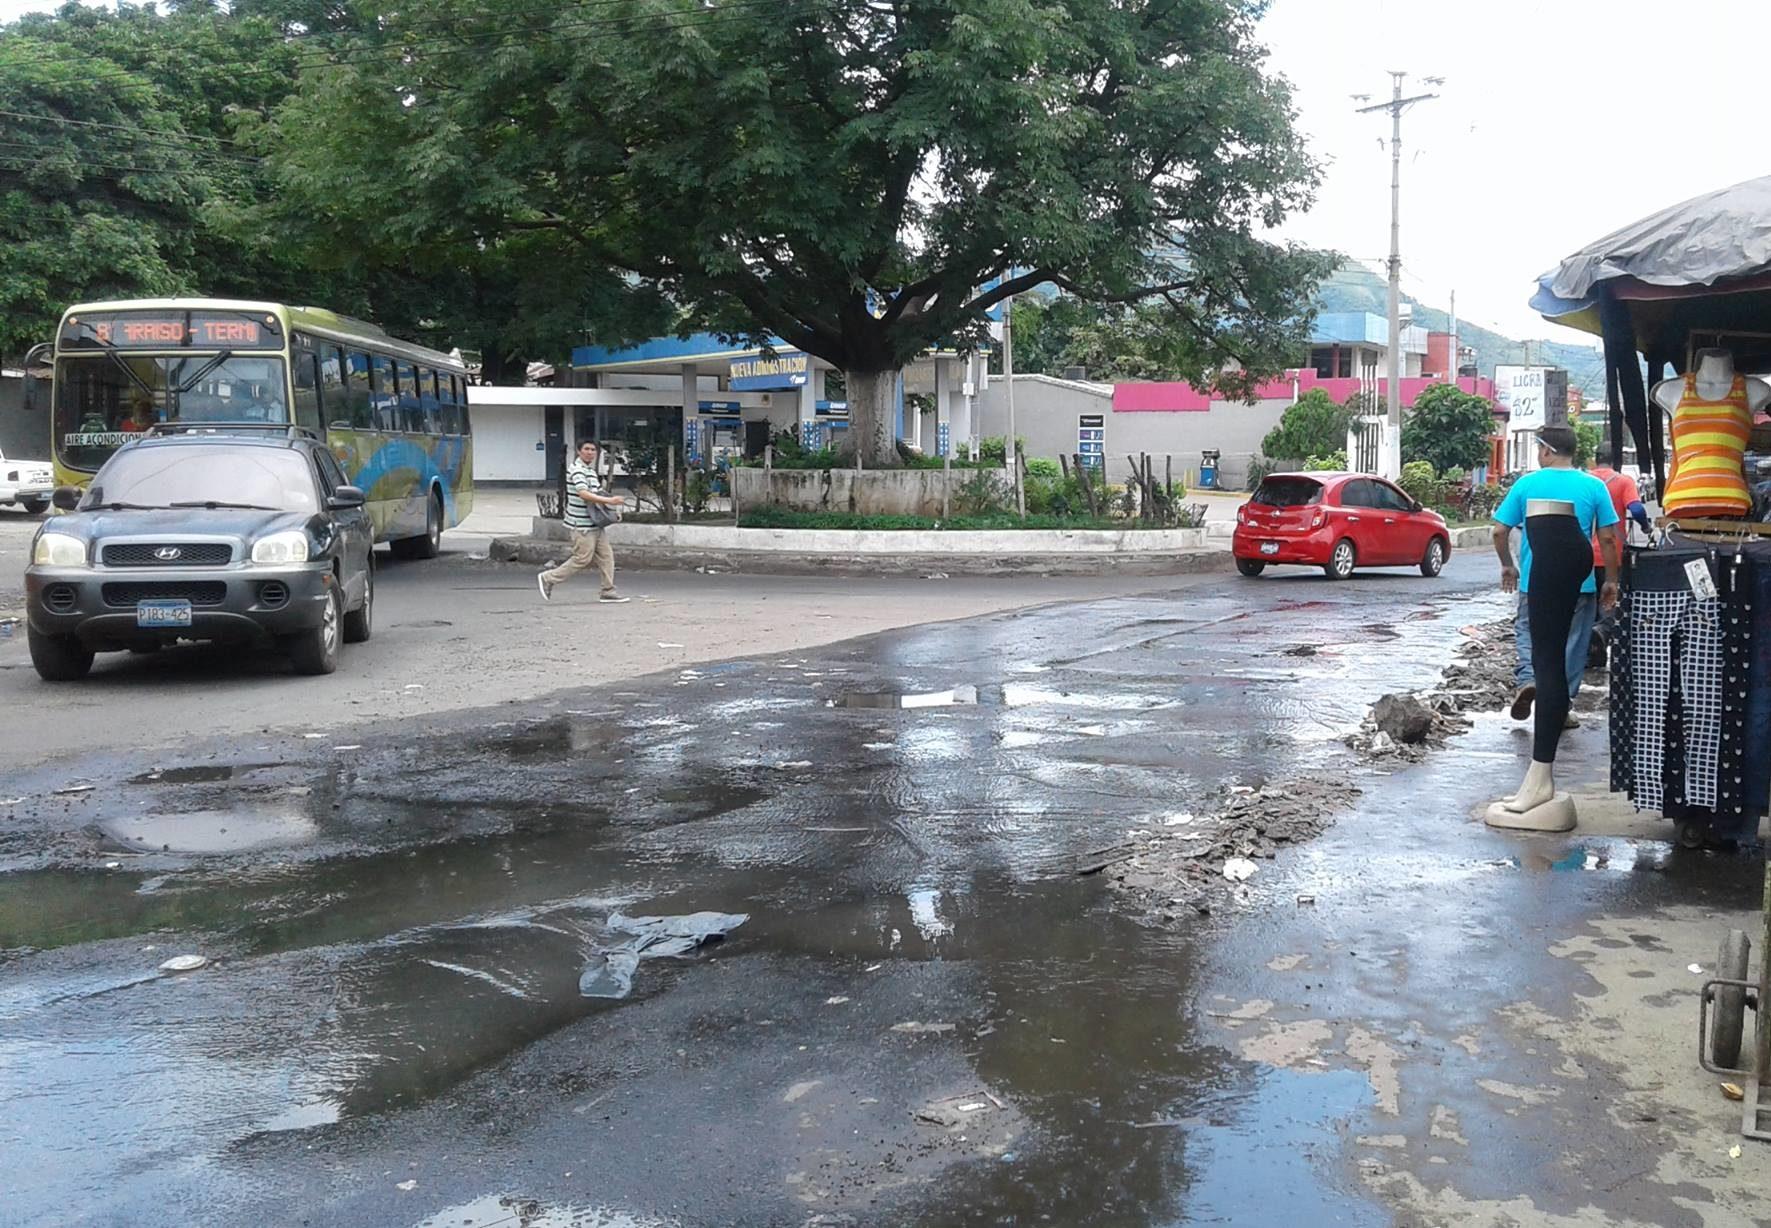 Tubería de aguas en Avenida Fray Felipe nuevamente dañada